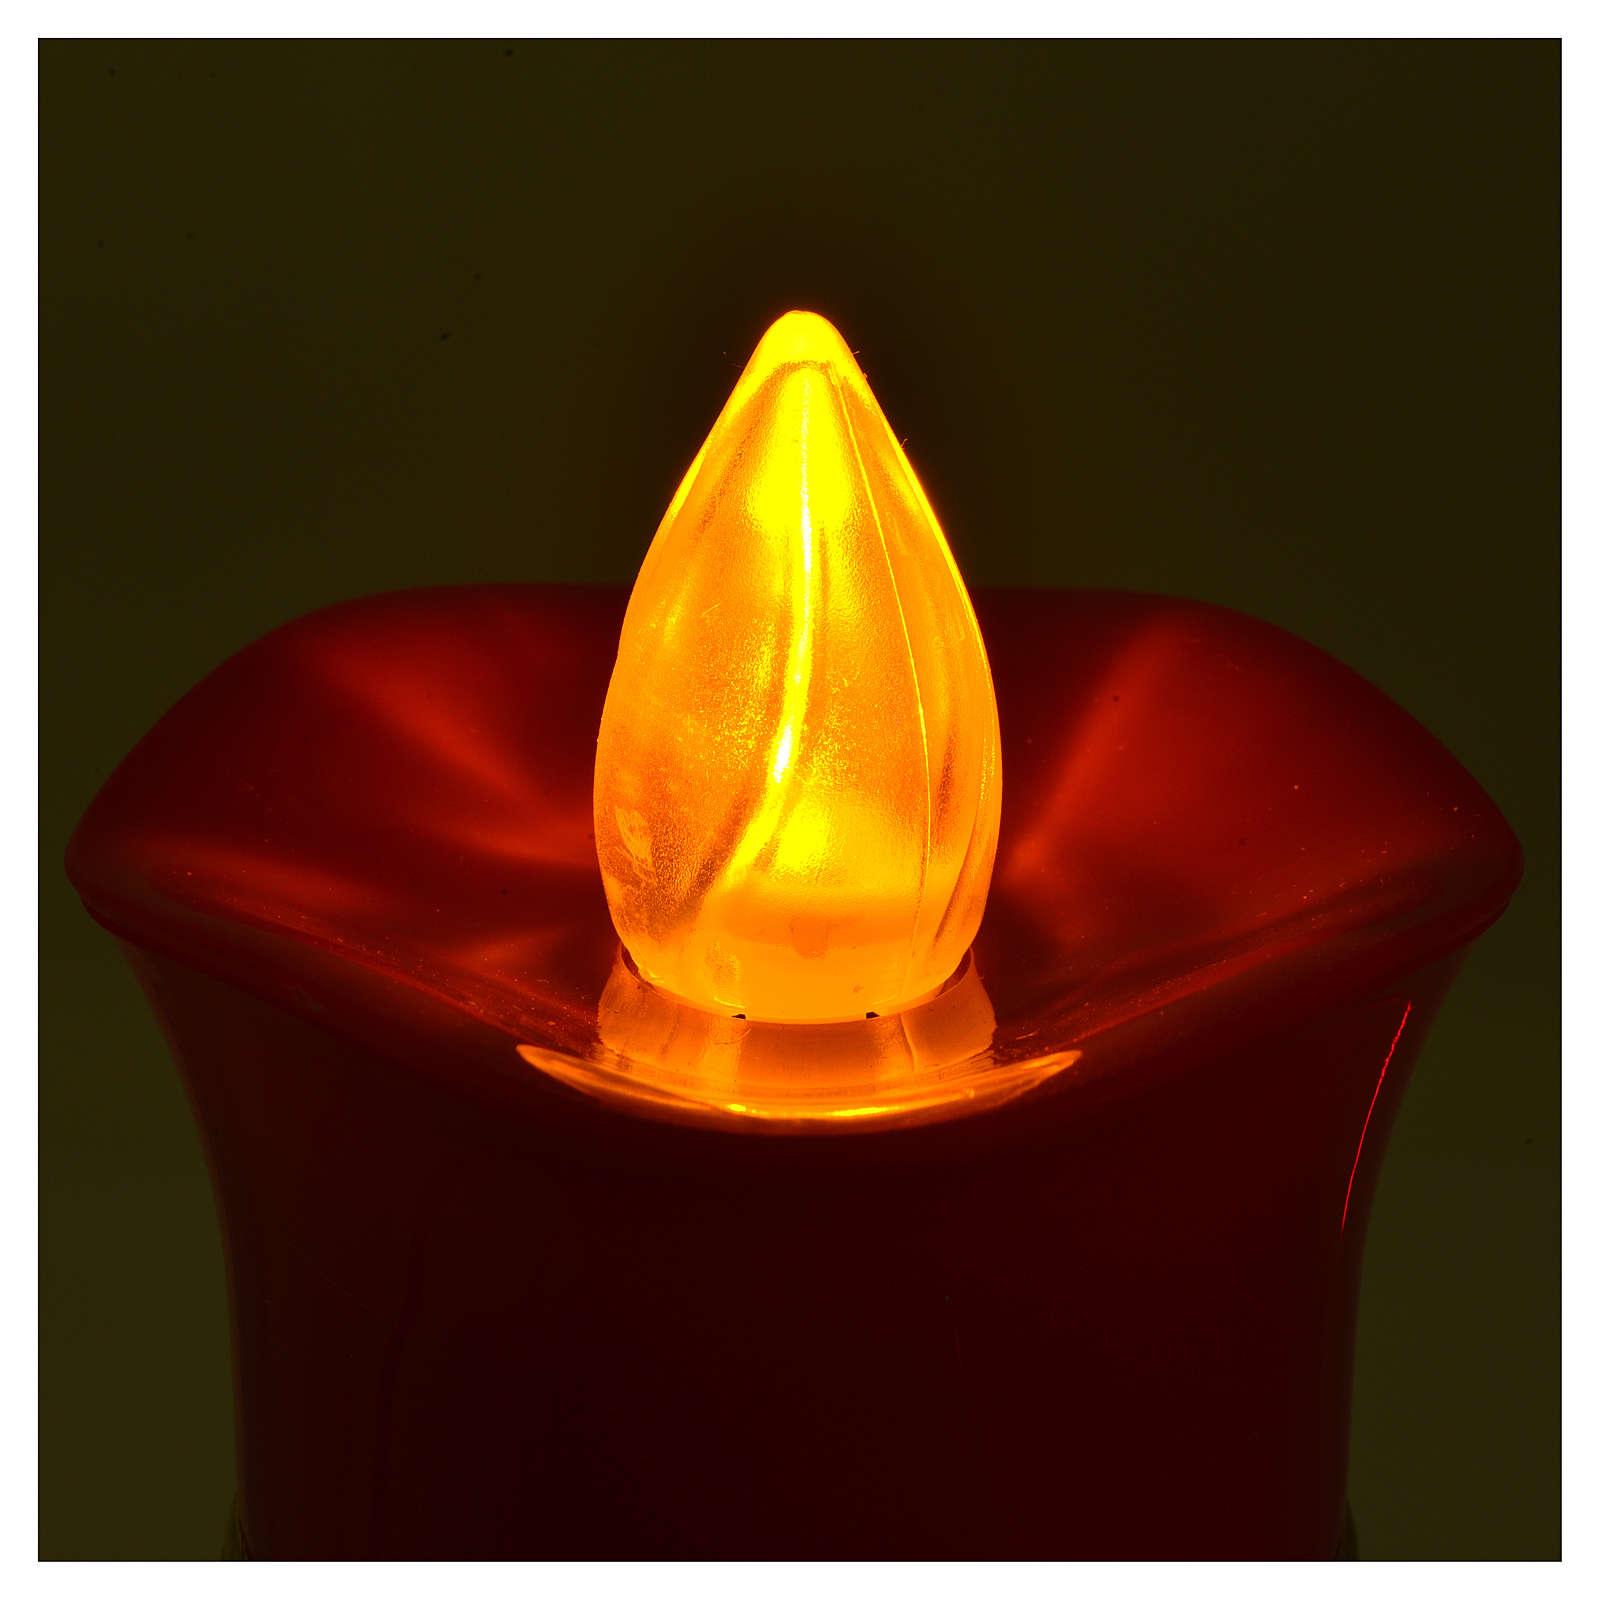 Veilleuse Lumada image Christ blanc flamme jaune tremblante 3